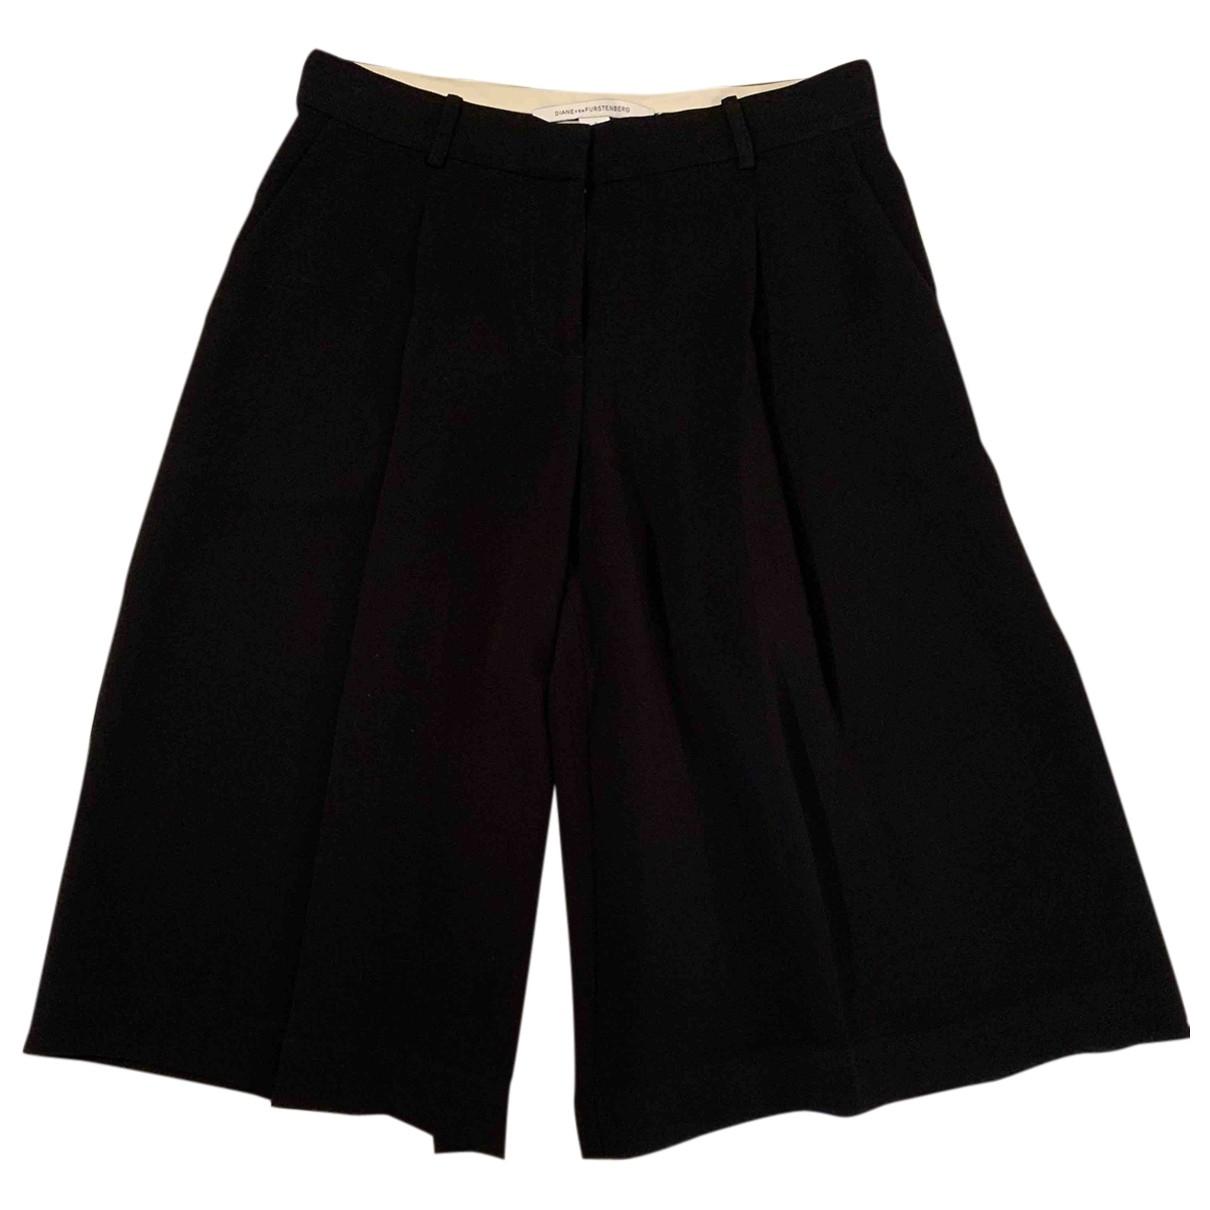 Pantalon en Poliester Negro Diane Von Furstenberg